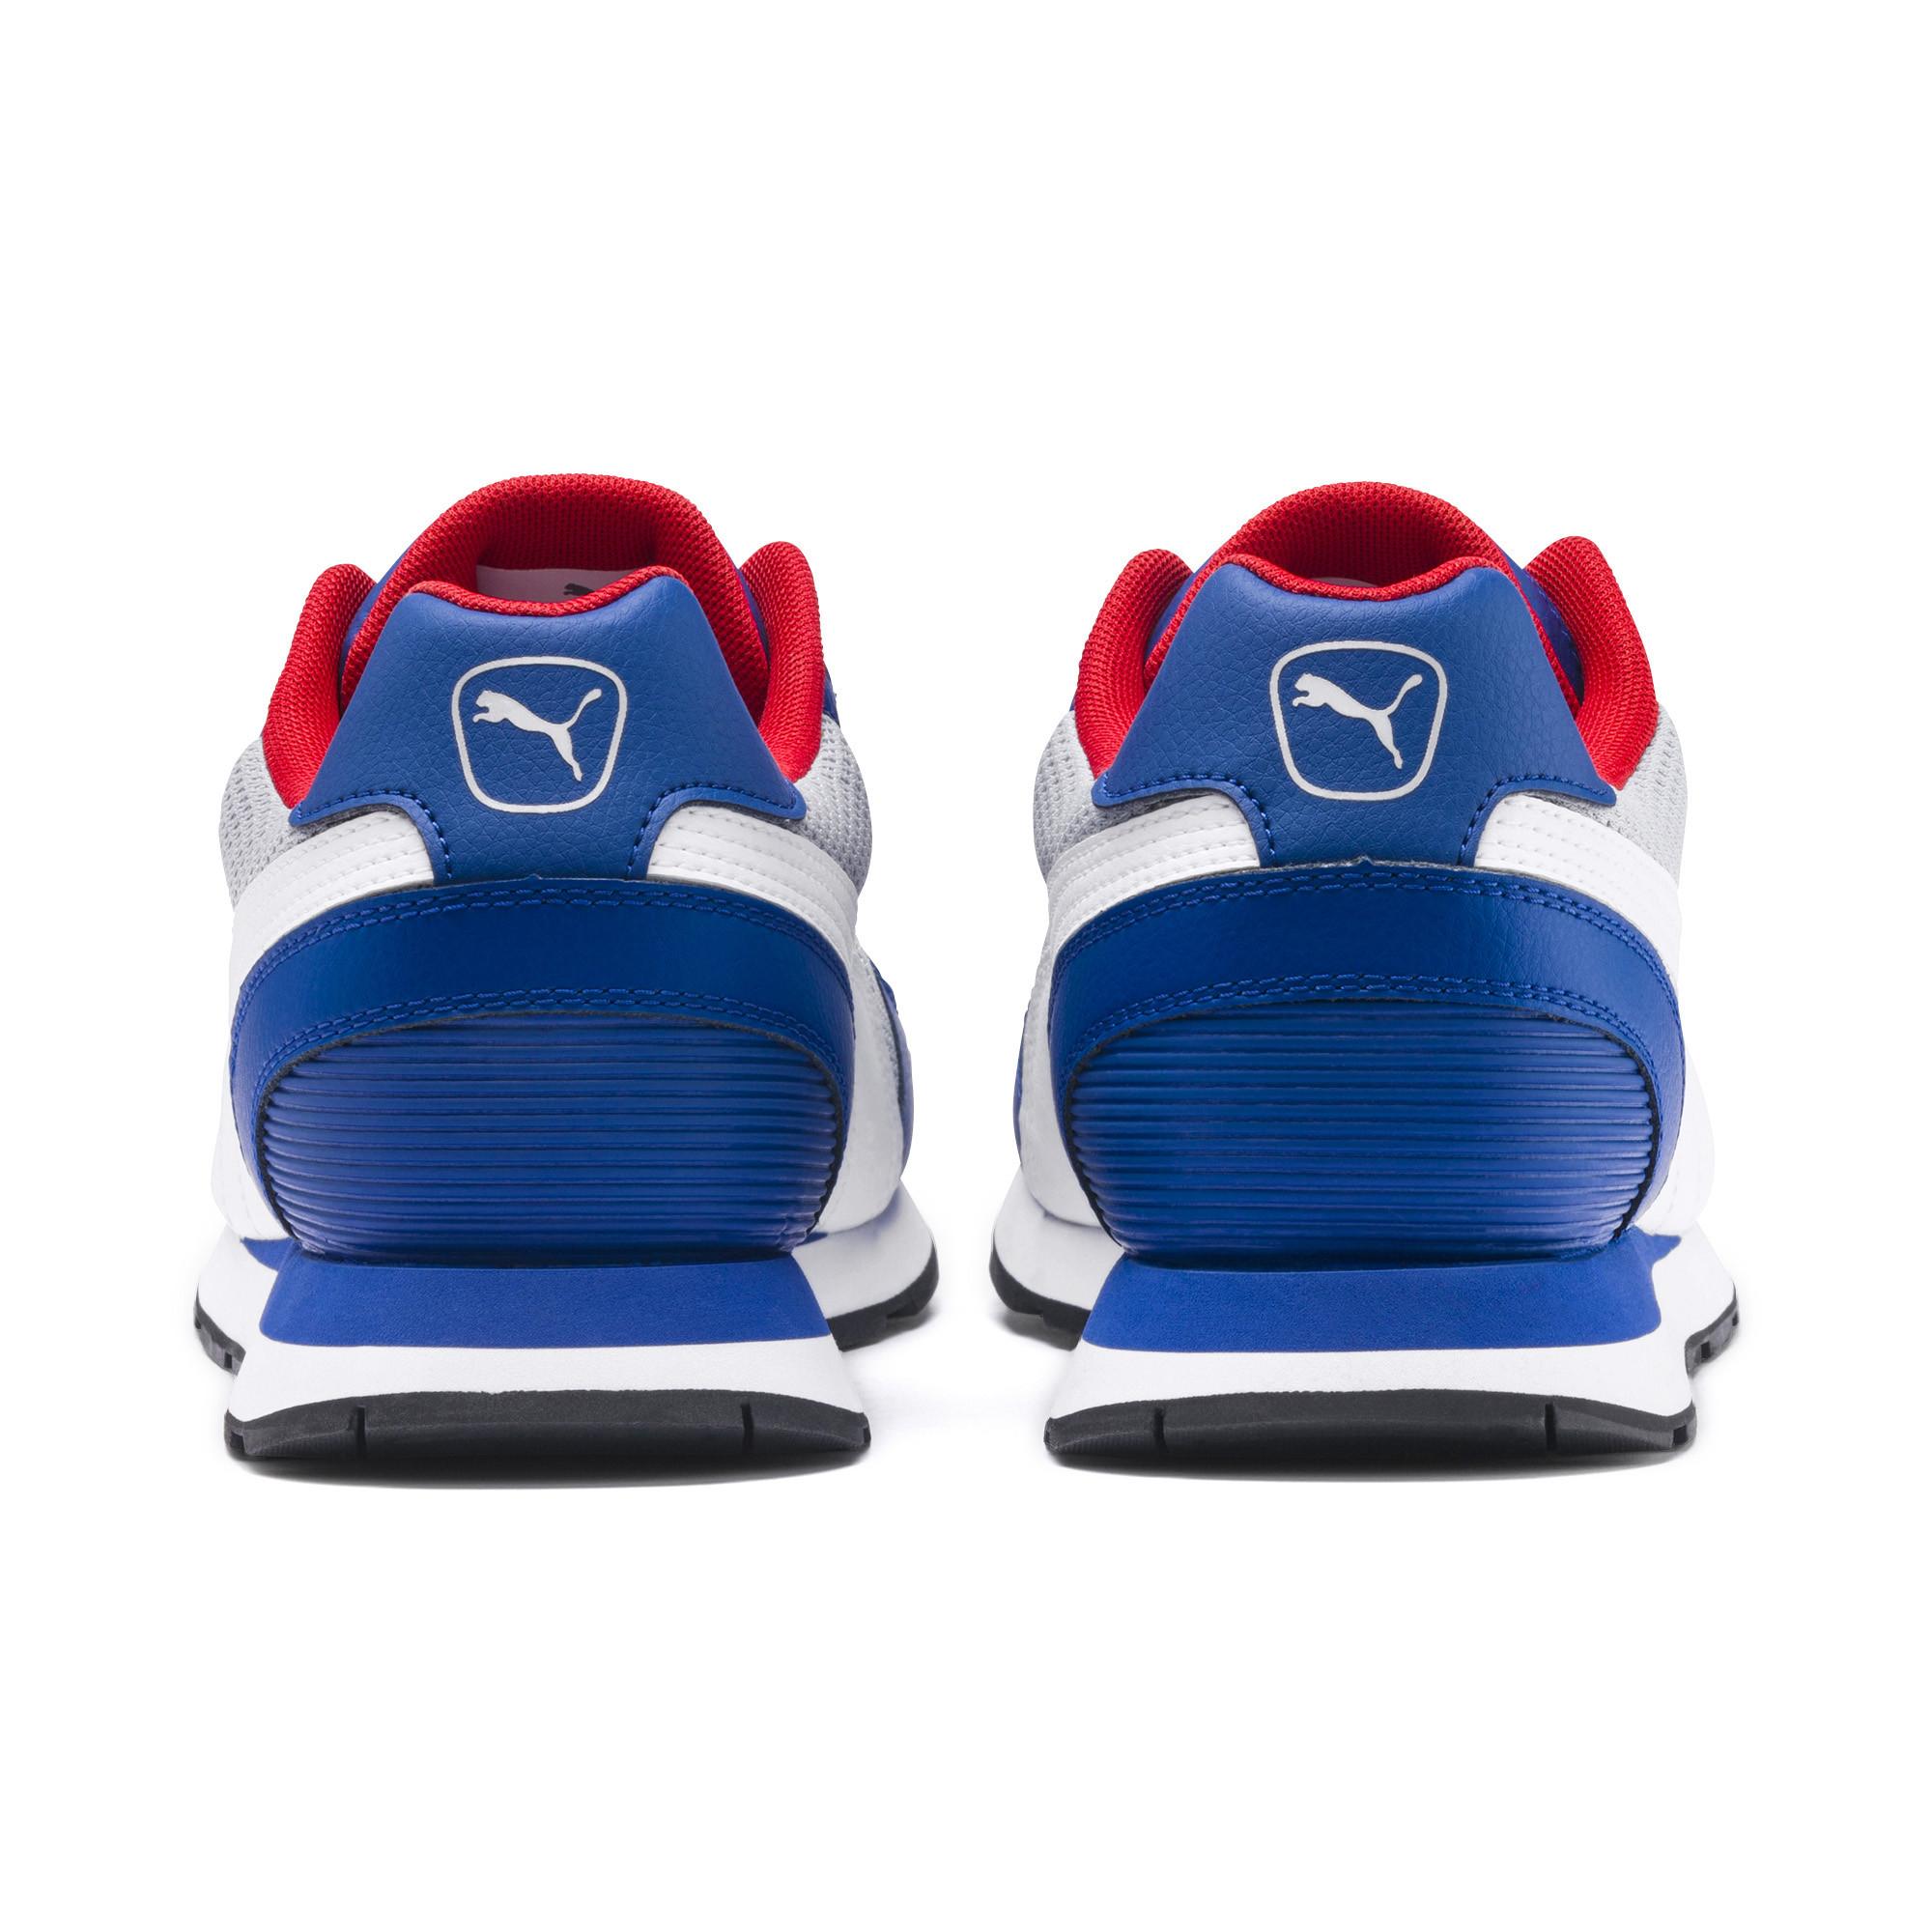 PUMA Vista Lux Sneakers Unisex Shoe Basics -ebay $28